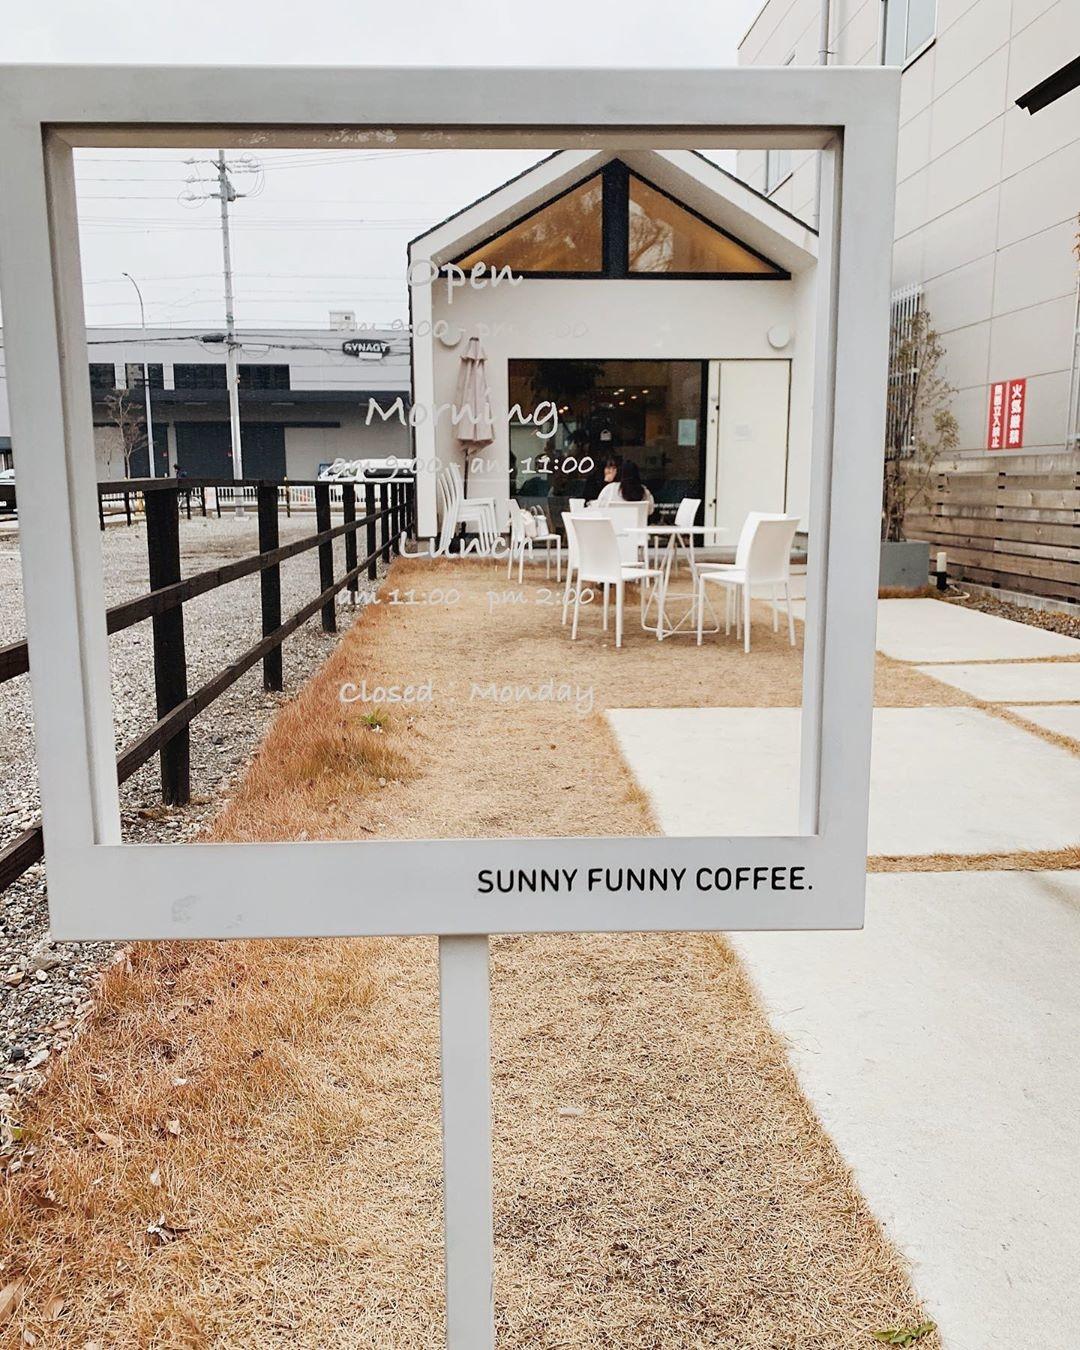 Sunny Funny Coffee